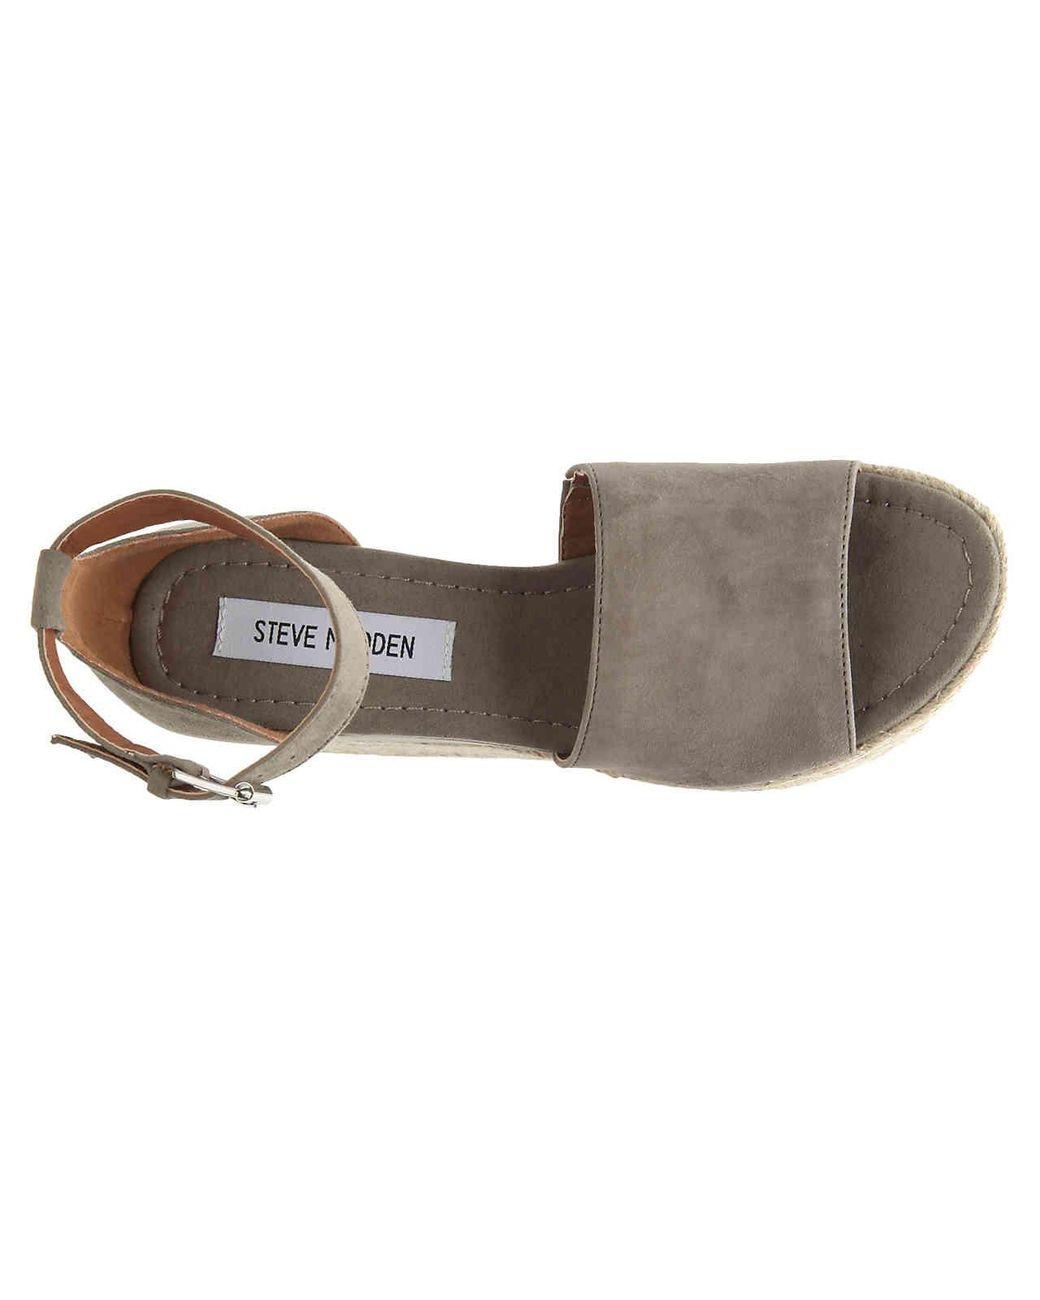 2bacd99cbd3 Lyst - Steve Madden Apolo Espadrille Wedge Sandal